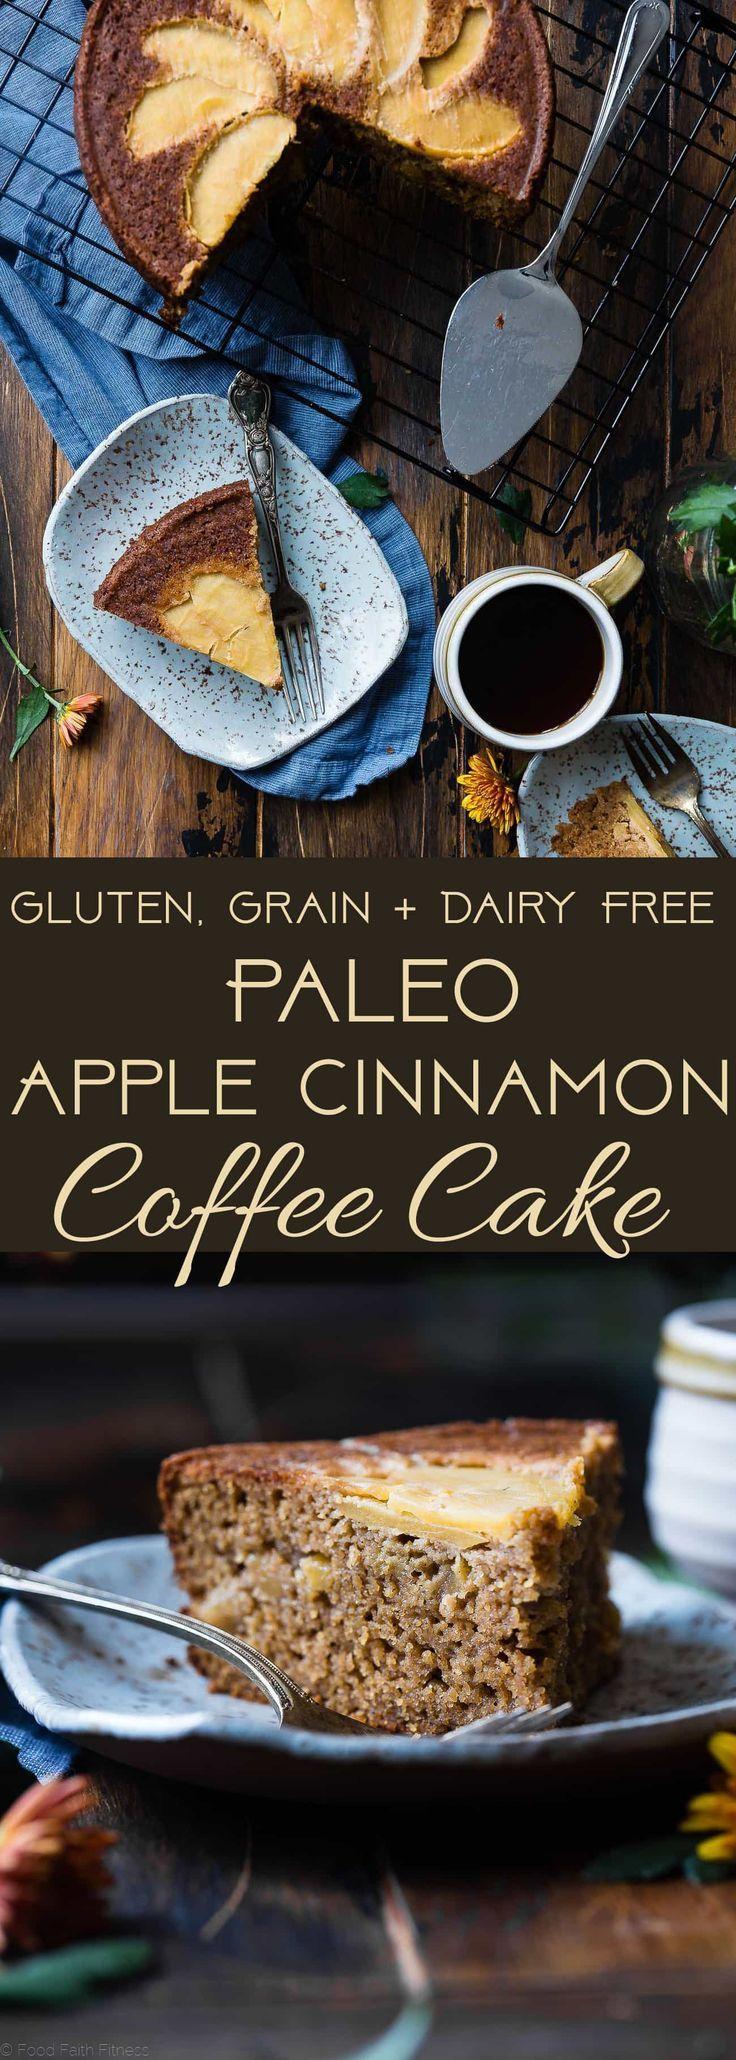 Gluten Free Apple Cinnamon Coffee Cake This gluten free